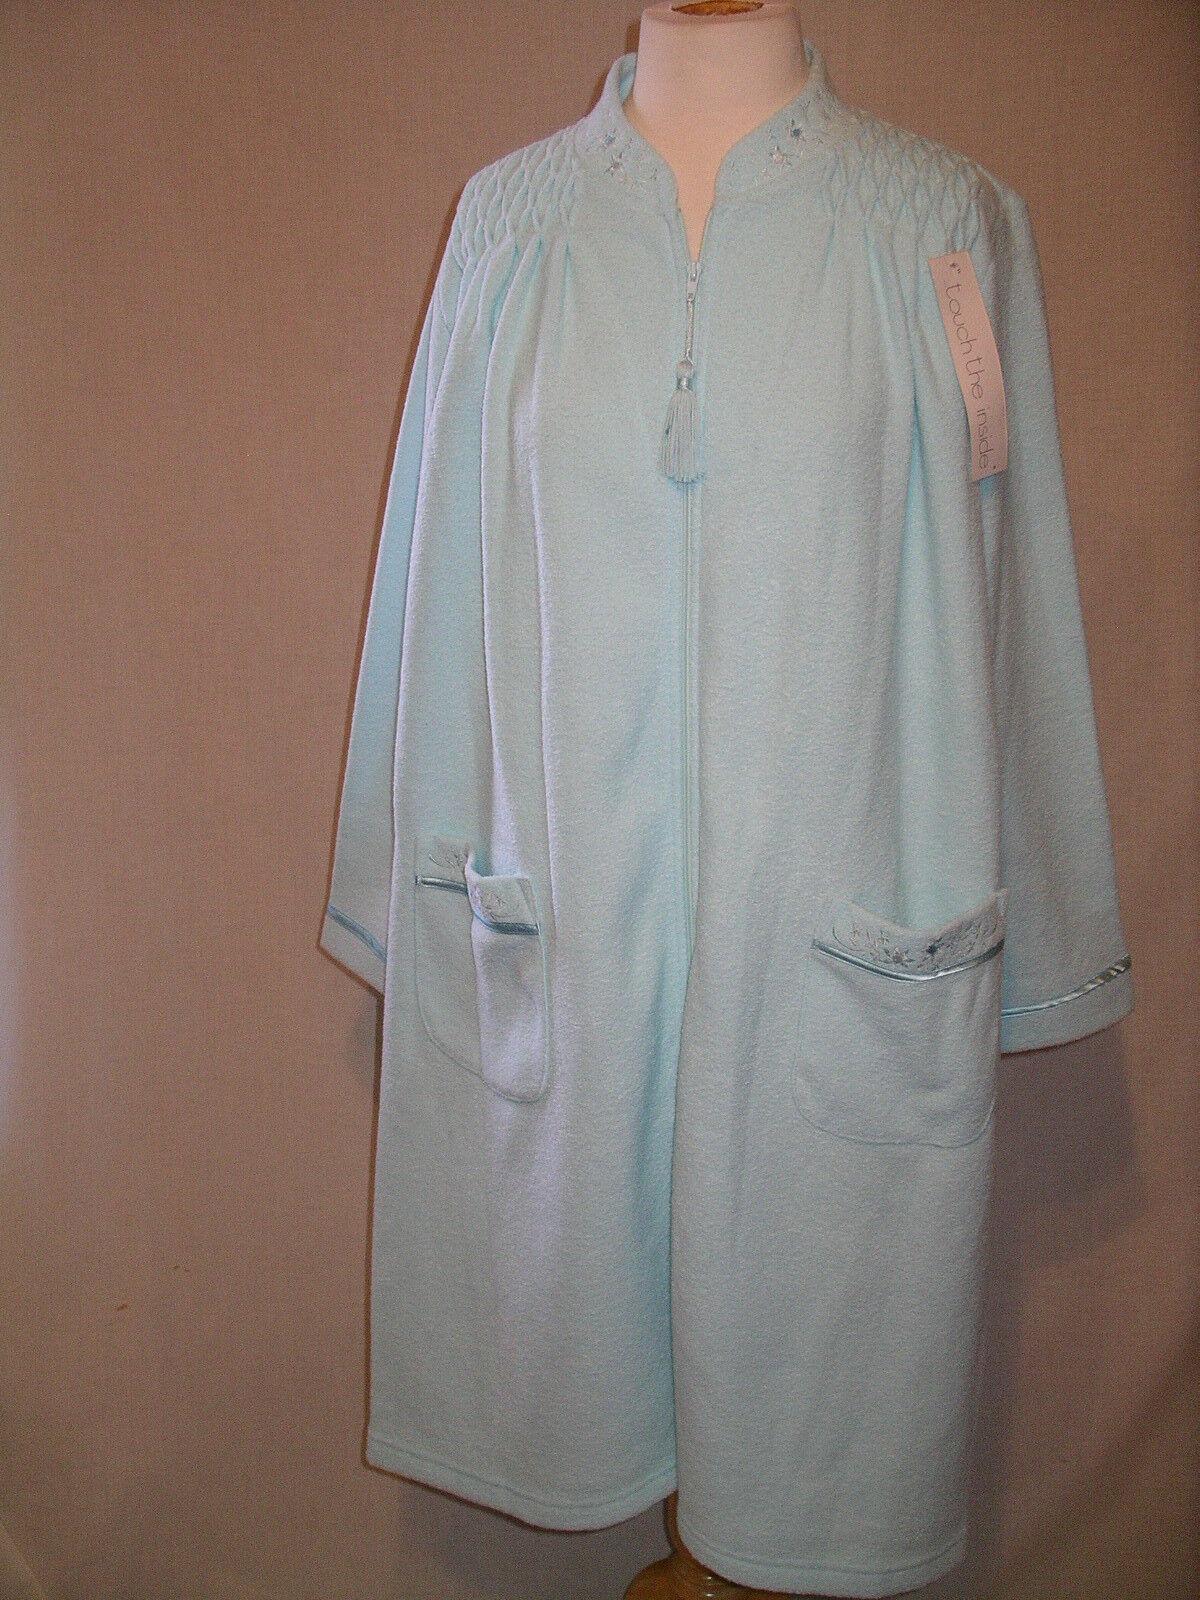 MISS ELAINE  Plush Soft Aqua Zip Front House Coat Robe - M - NWT  54